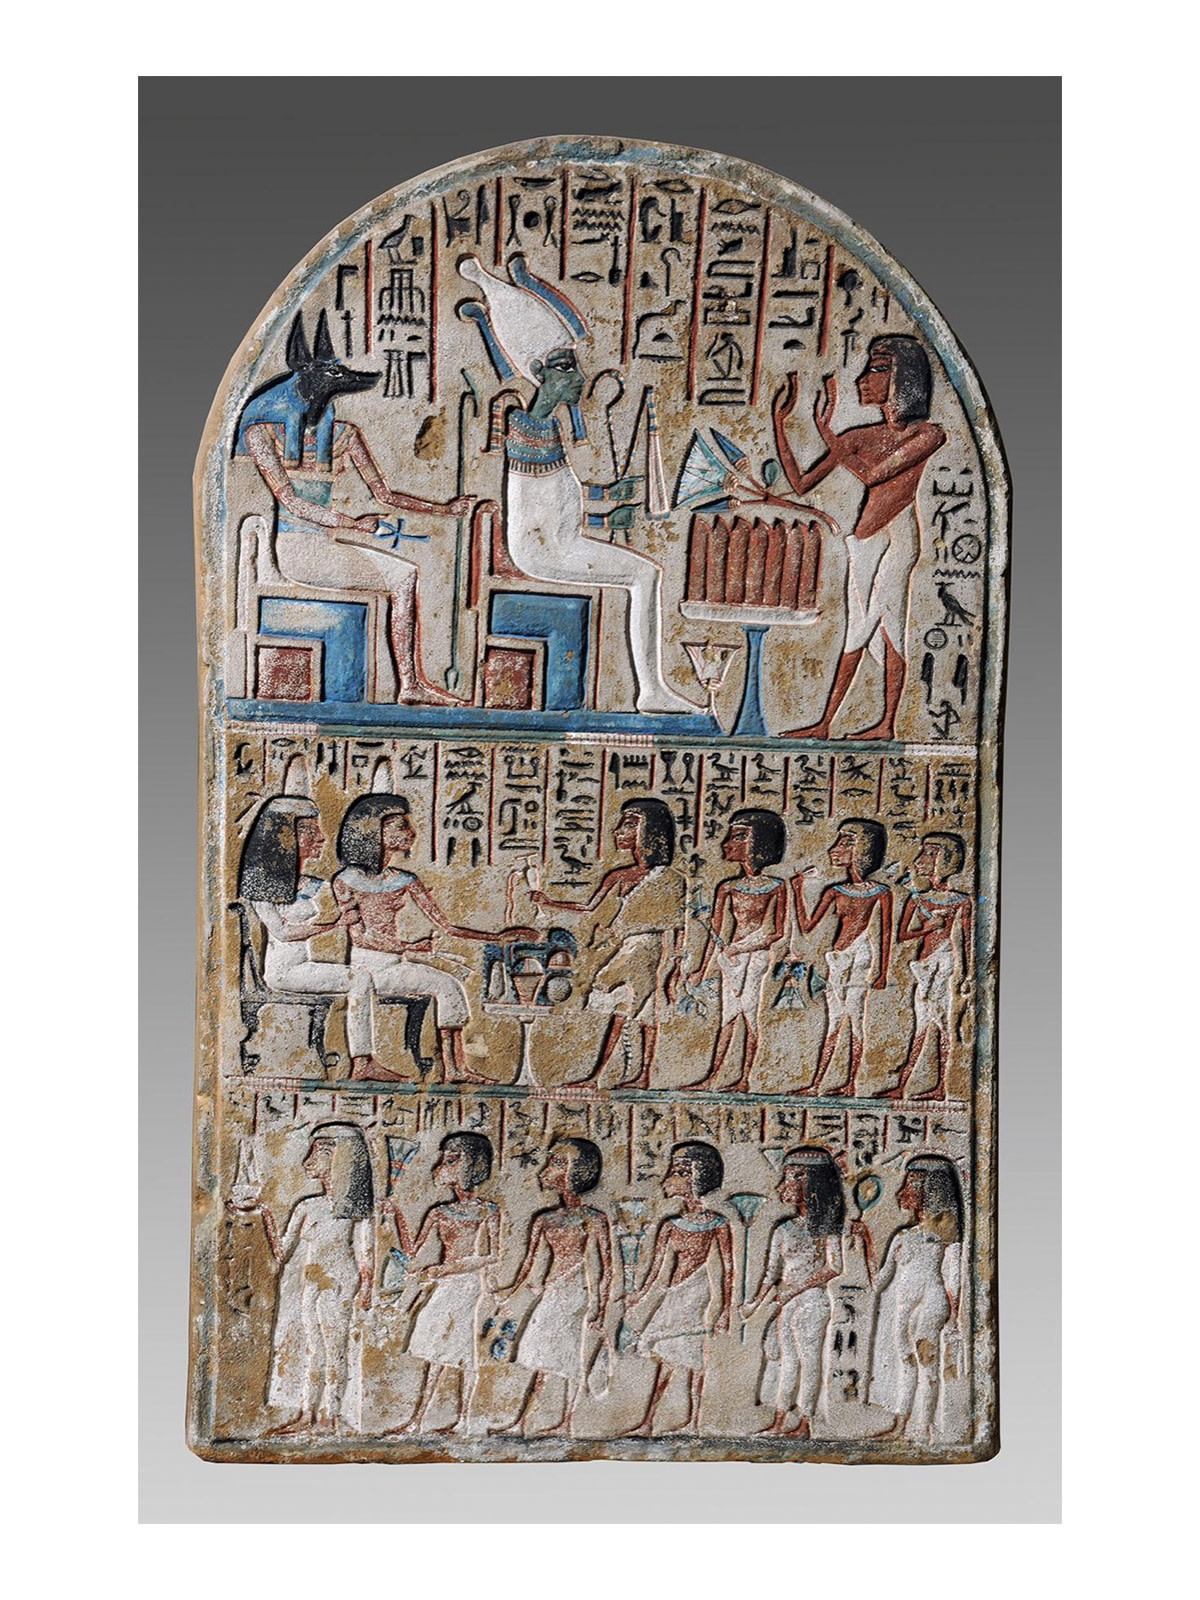 Queen Nefertari's Egypt